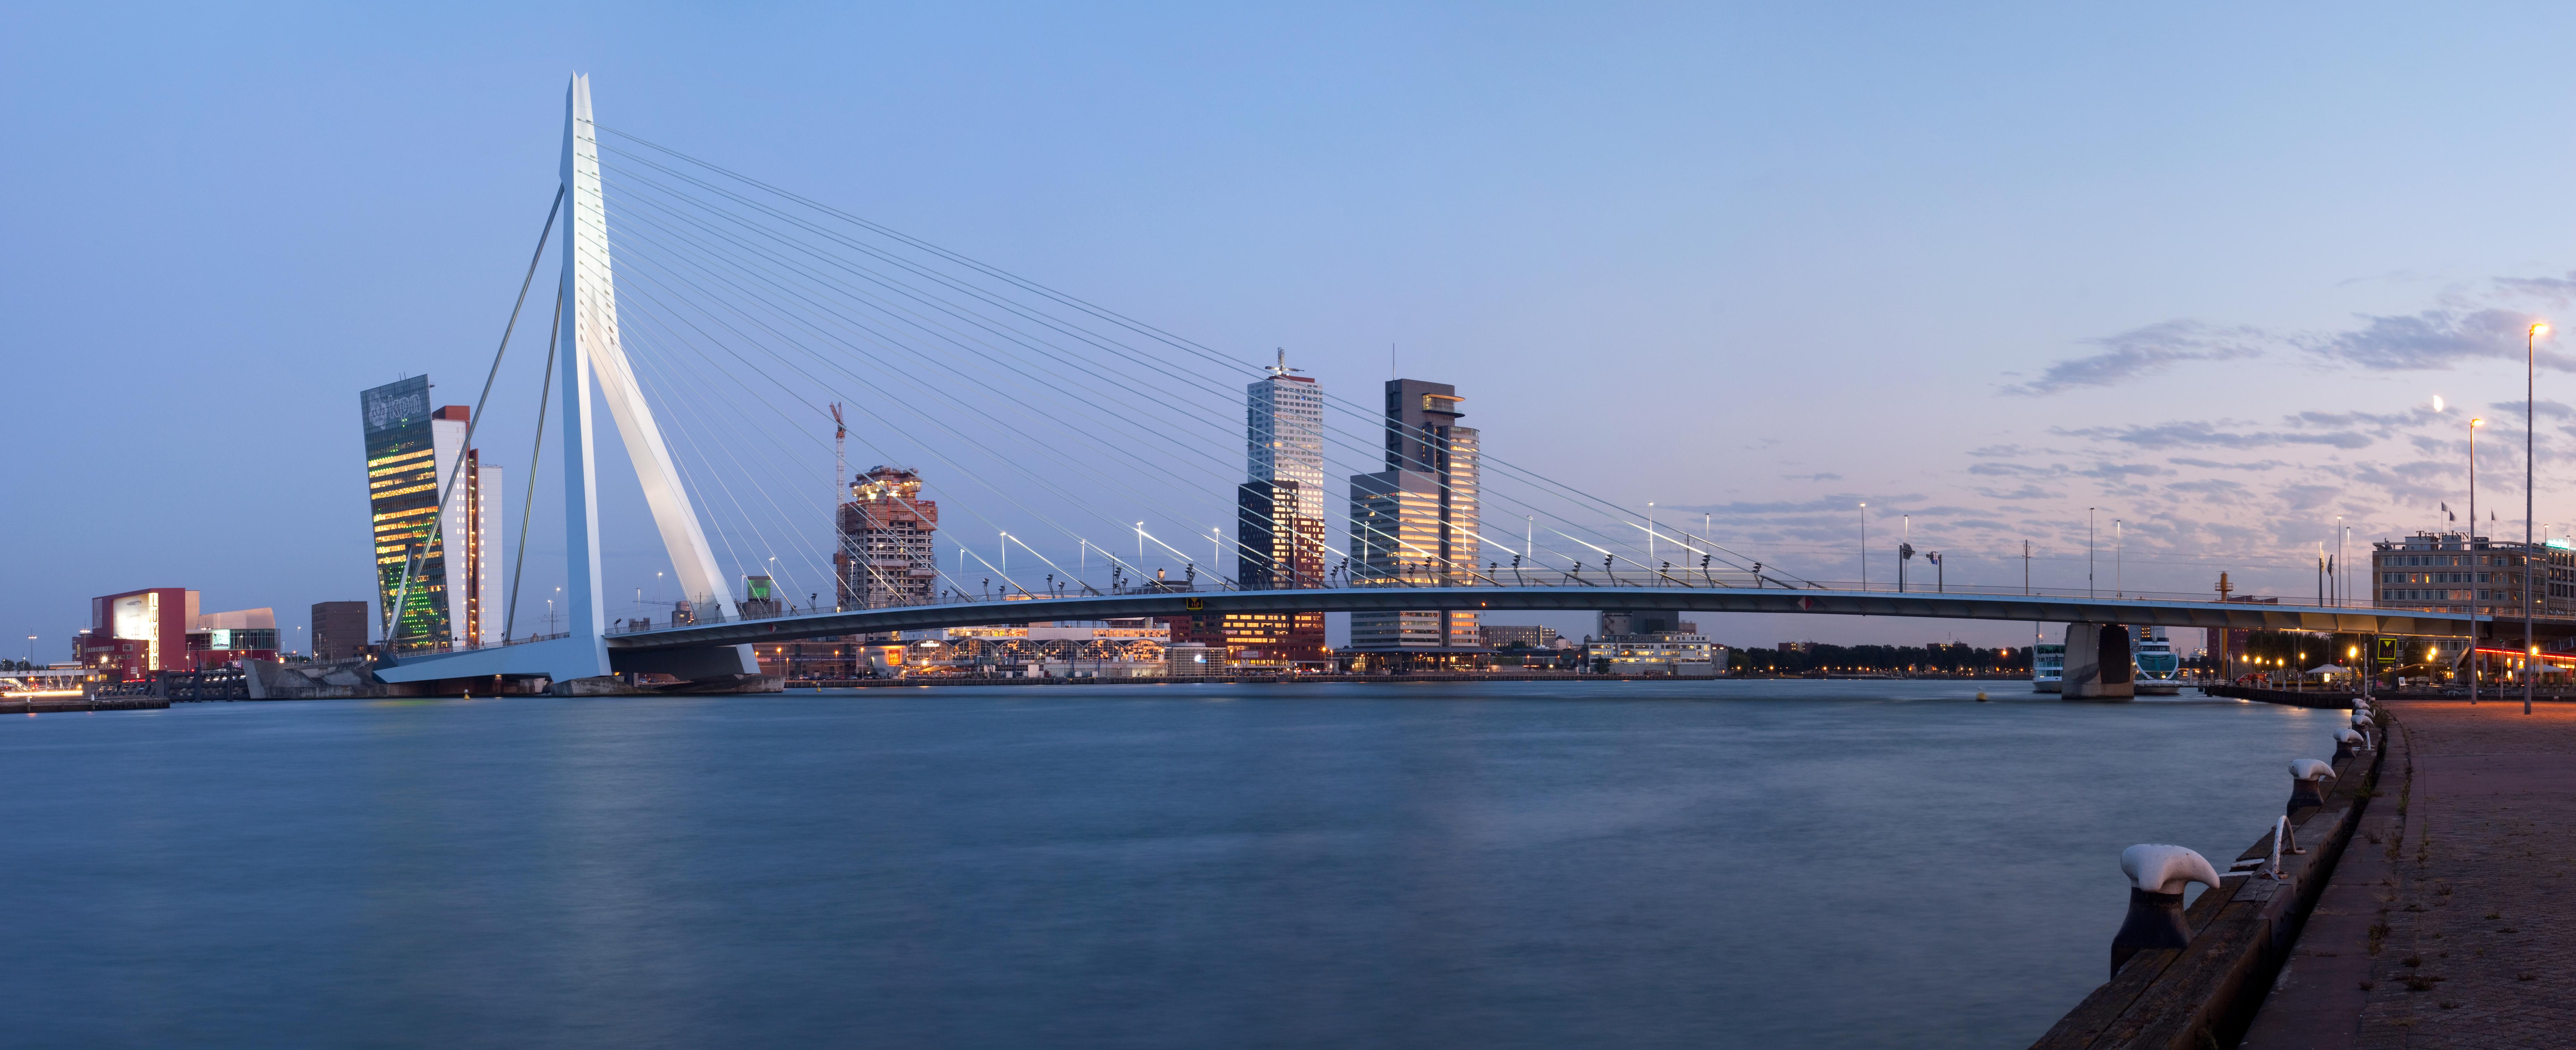 https://upload.wikimedia.org/wikipedia/commons/6/69/RotterdamMaasNederland.jpg